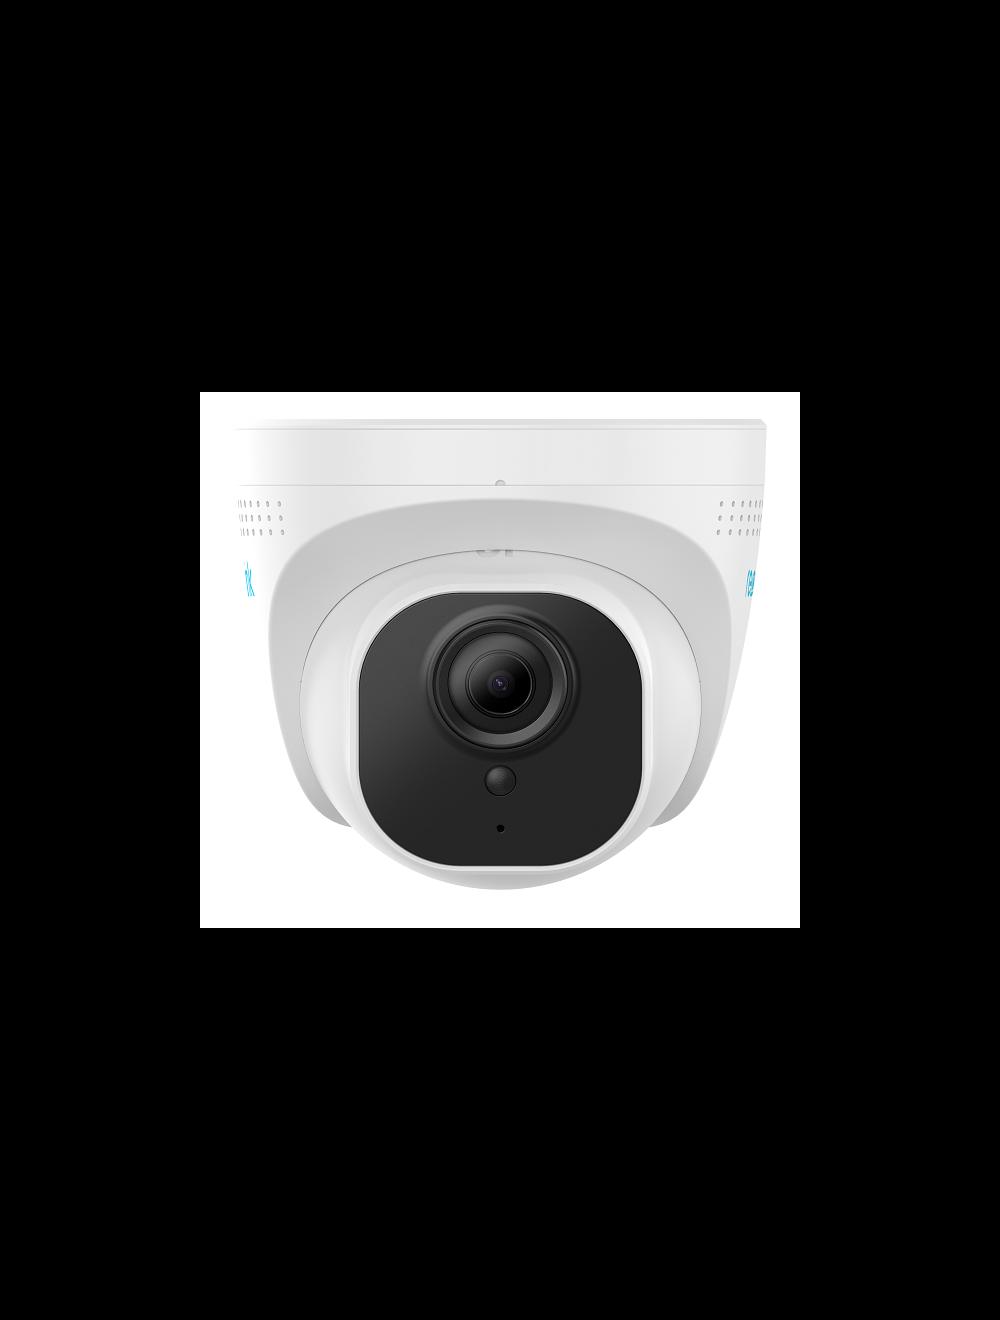 Reolink RLC-820A | 4K | 8 Megapixel | POE | Intelligente Erkennung |